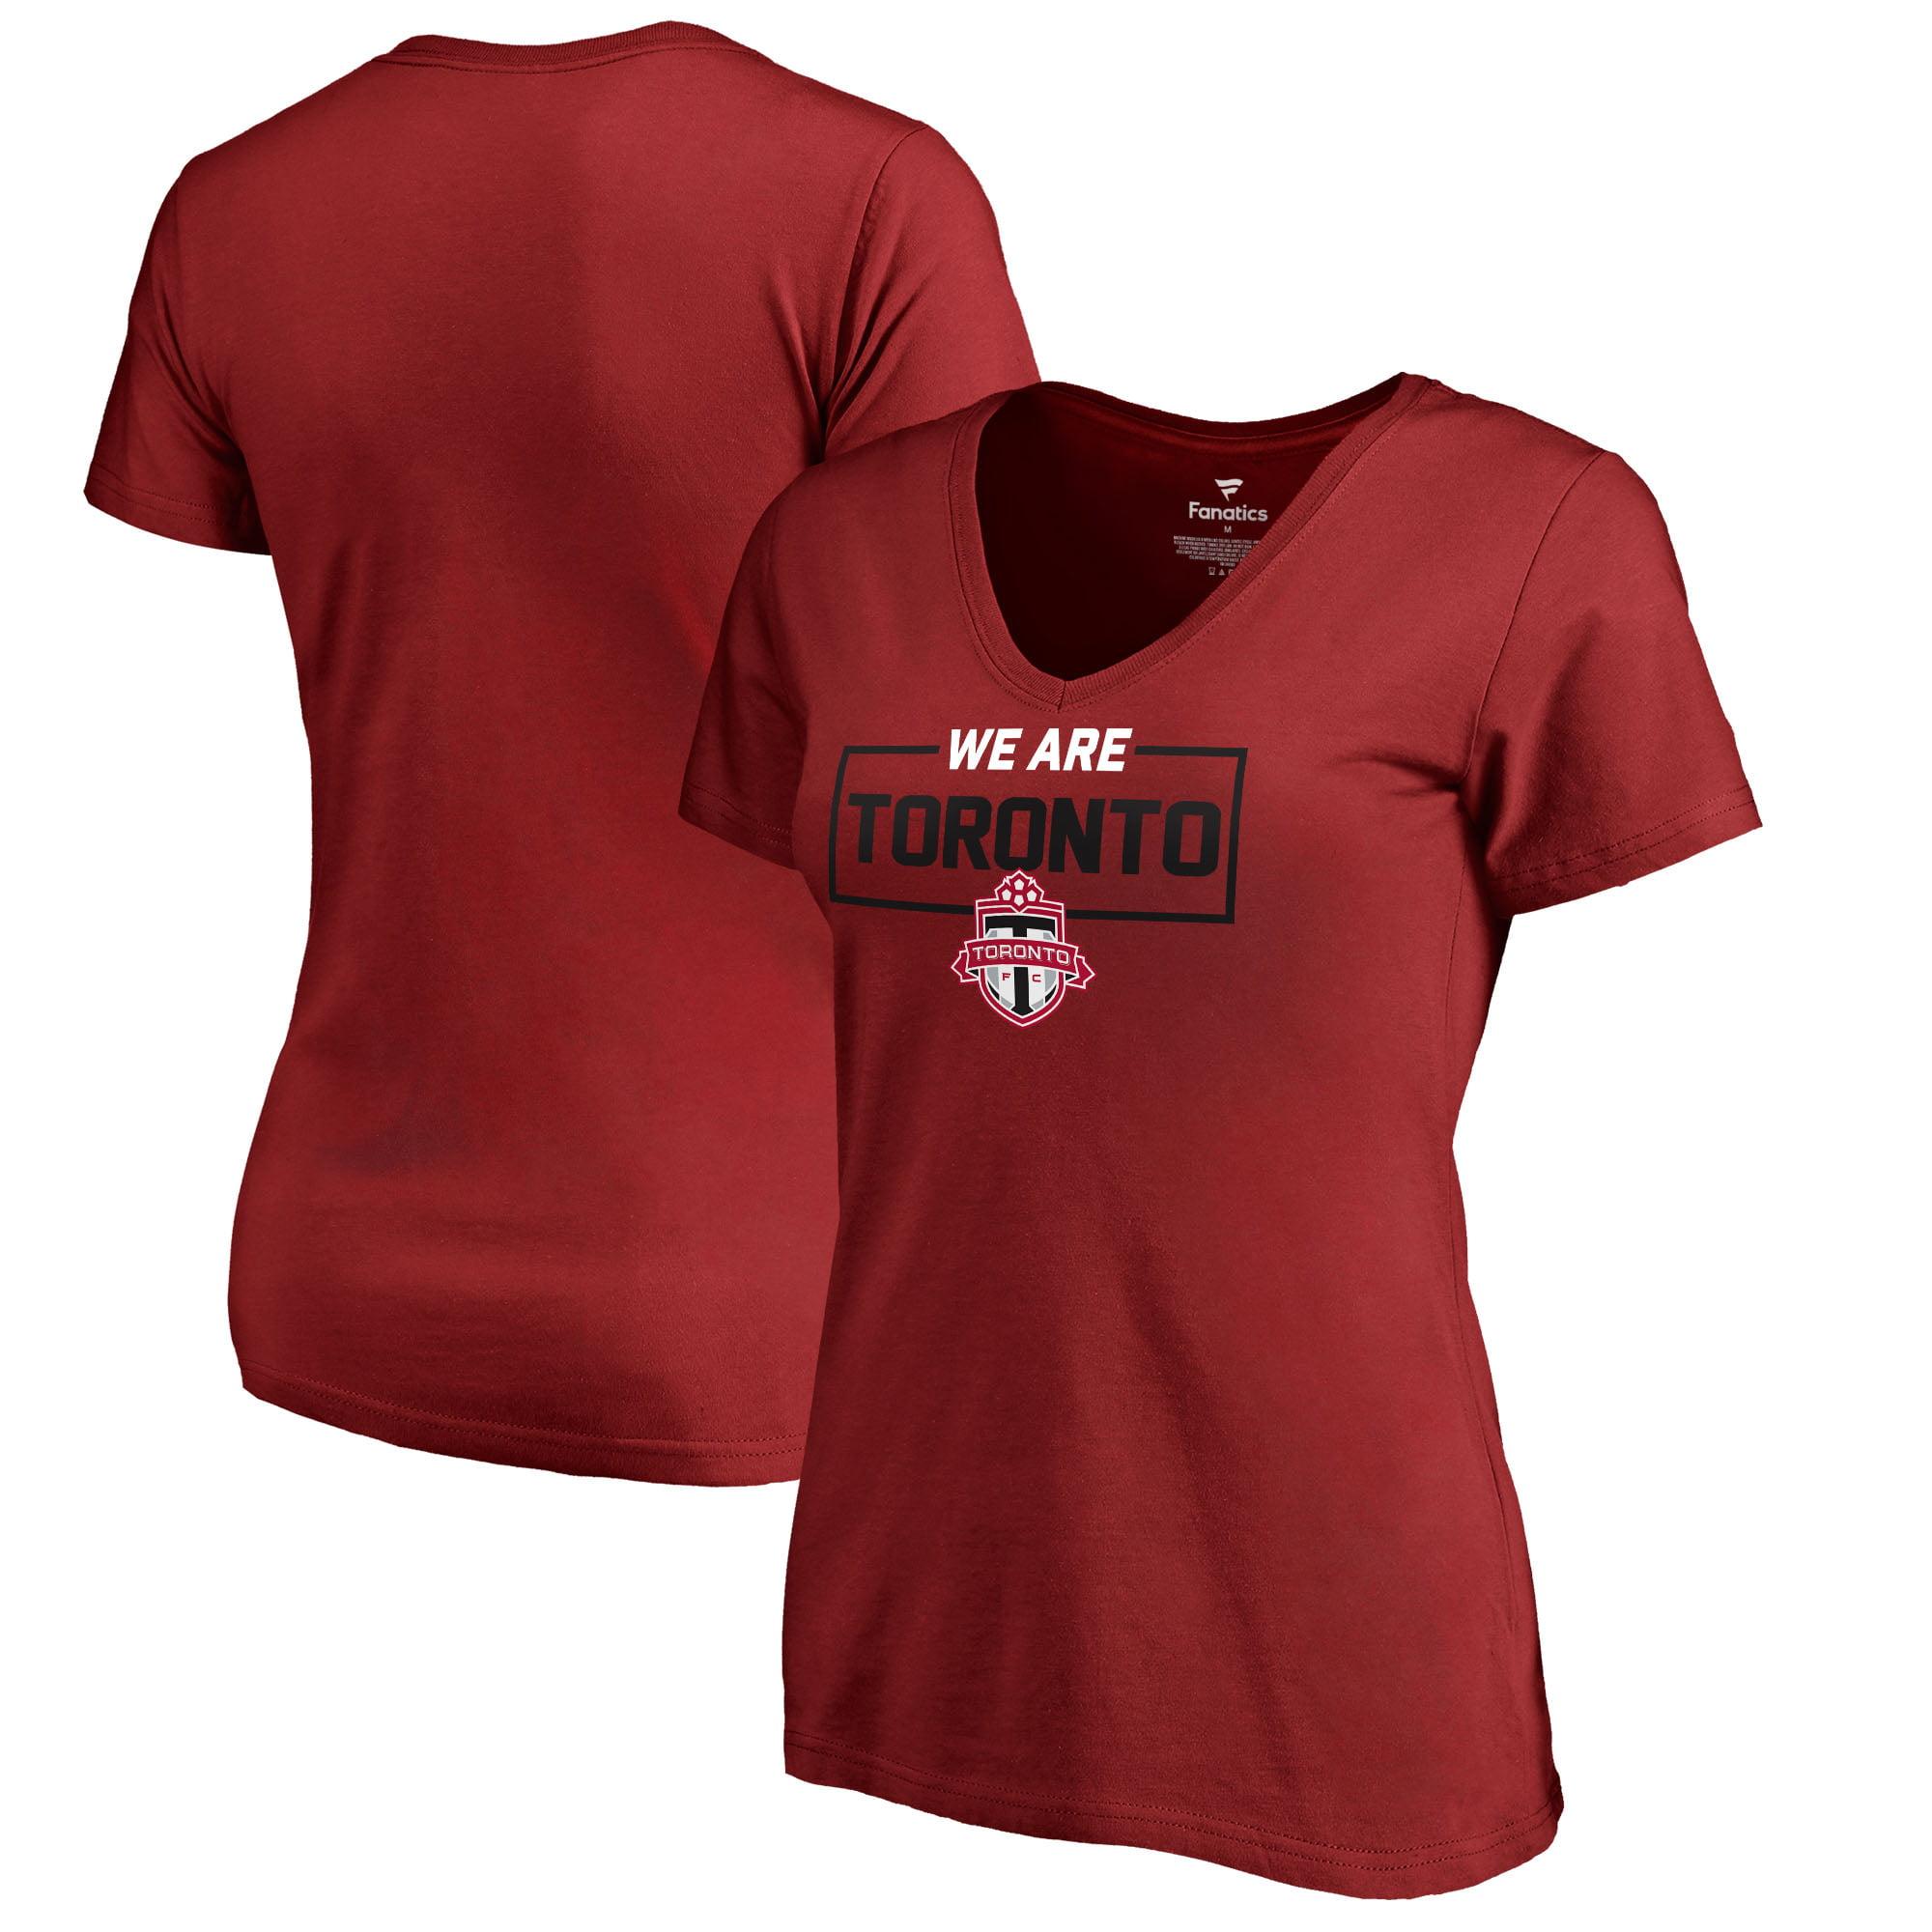 Toronto FC Fanatics Branded Women's We Are V-Neck T-Shirt - Red